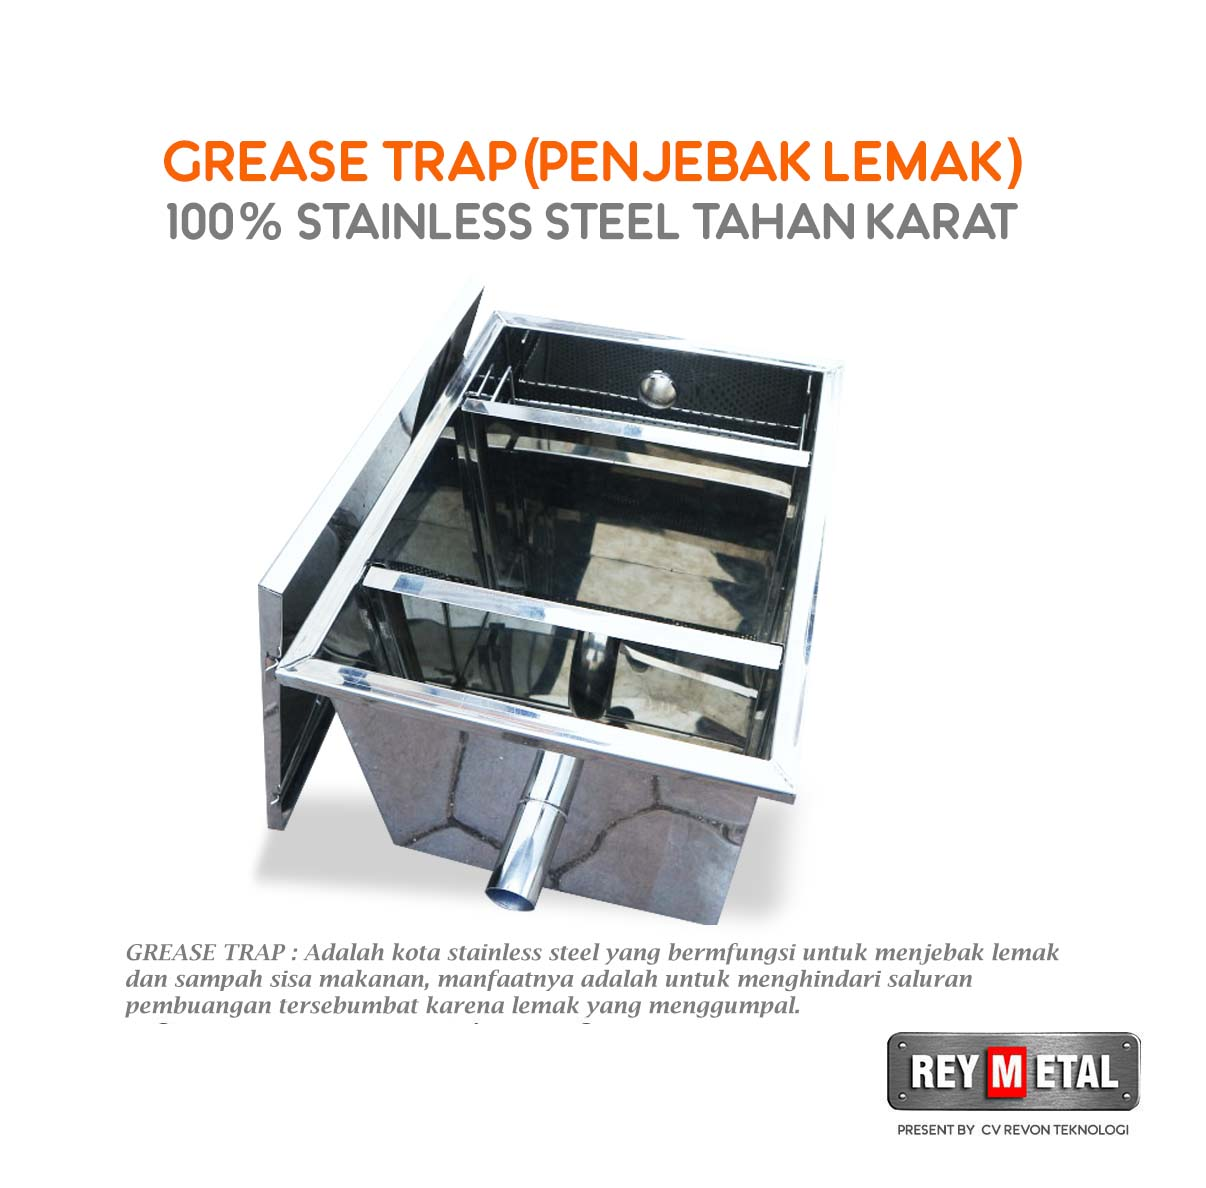 Jual grease Trap Tasikmalaya Jawa Barat